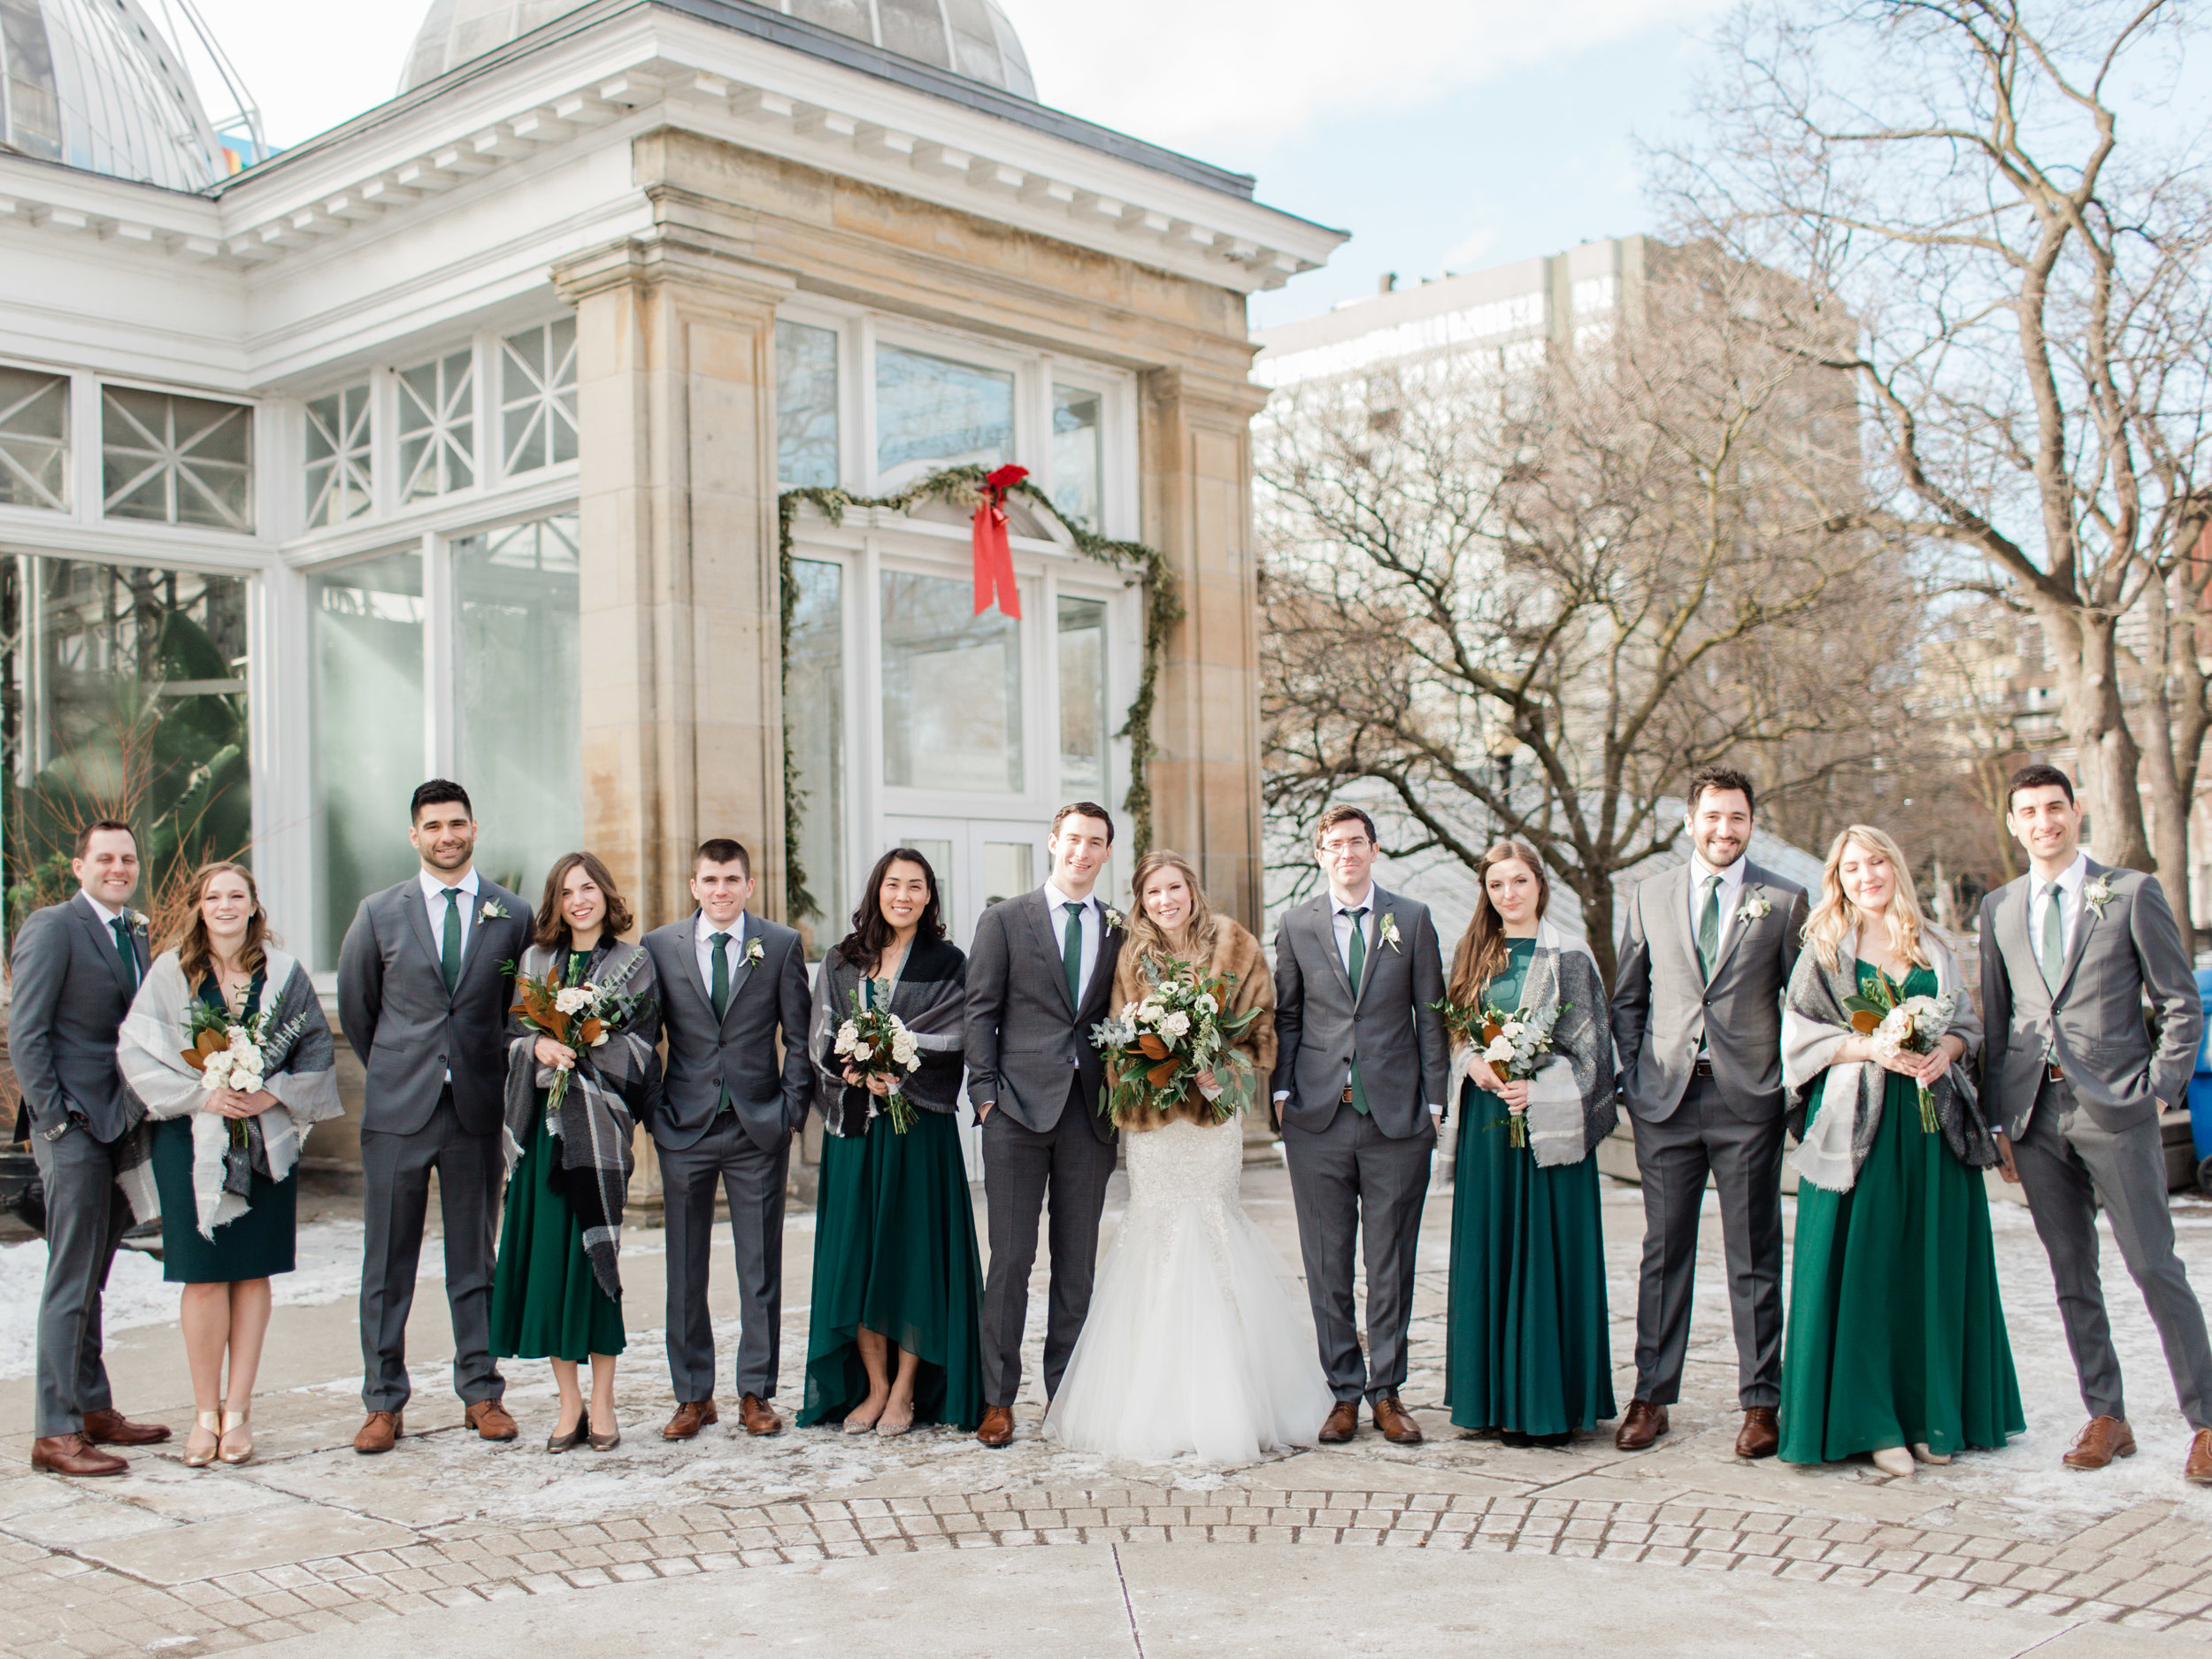 Toronto-wedding-photographer-downtown-winter-wedding-intimate-restaurant-canoe54.jpg